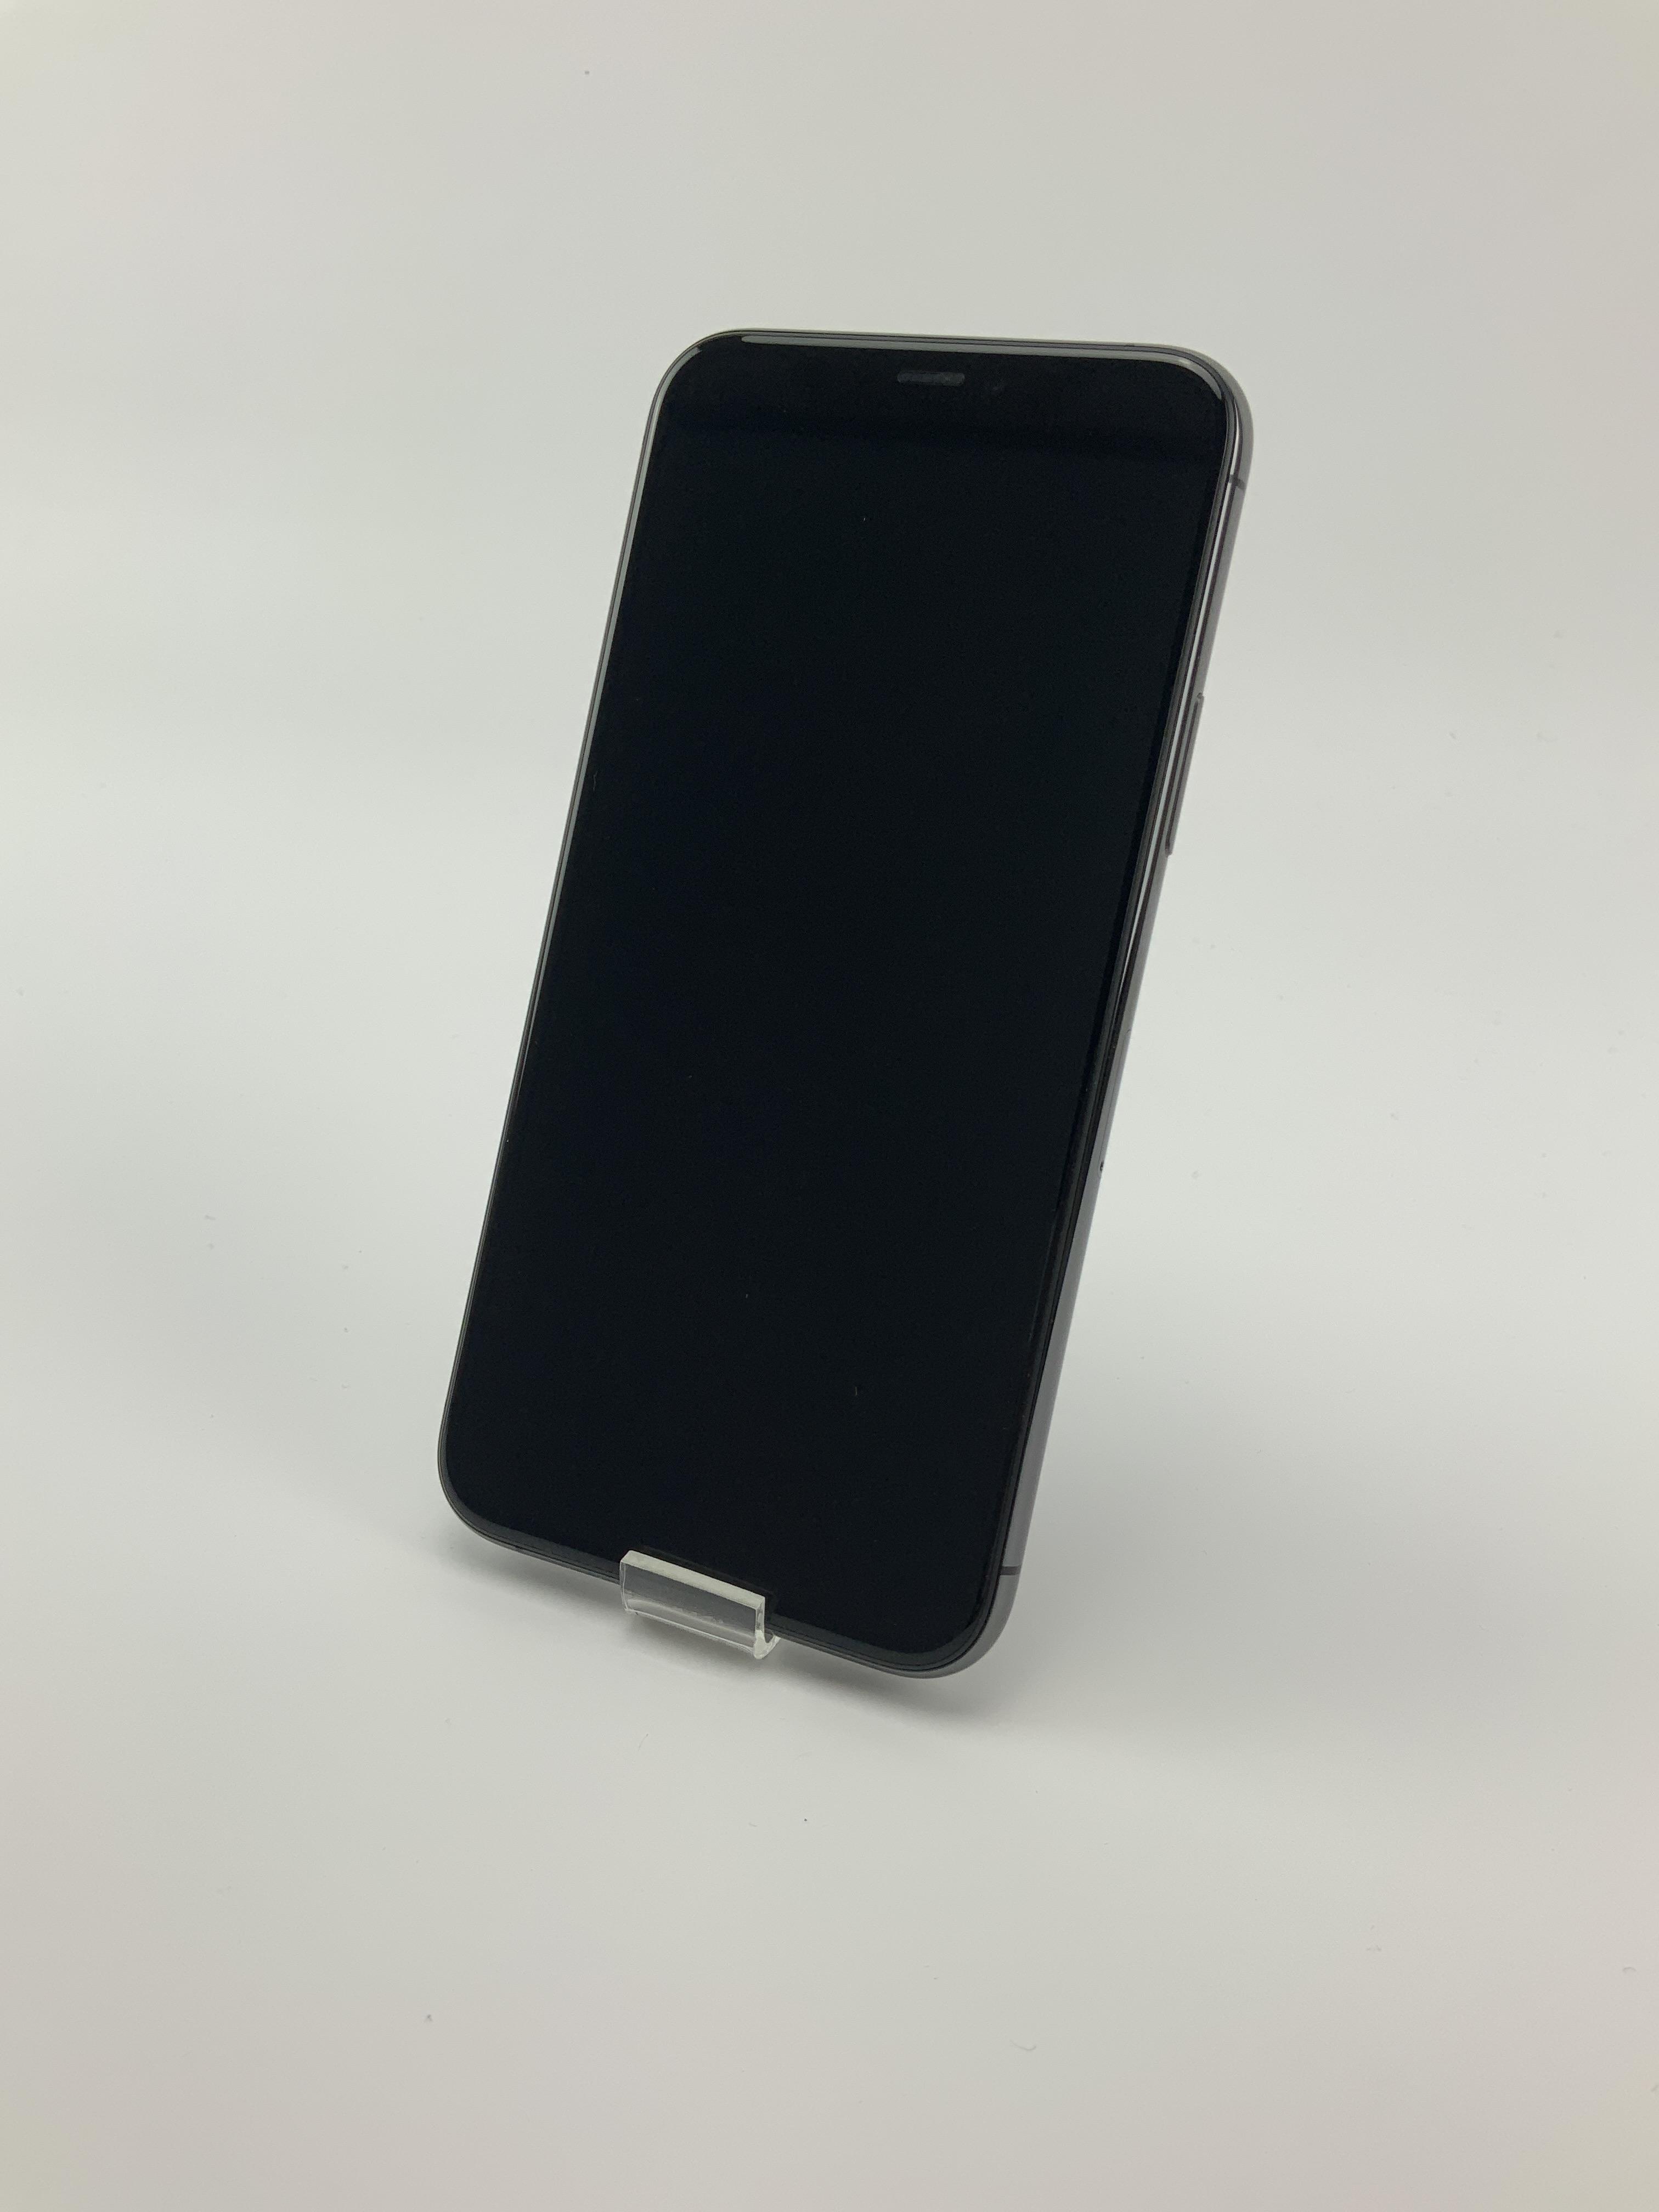 iPhone 11 Pro 64GB, 64GB, Space Gray, immagine 1